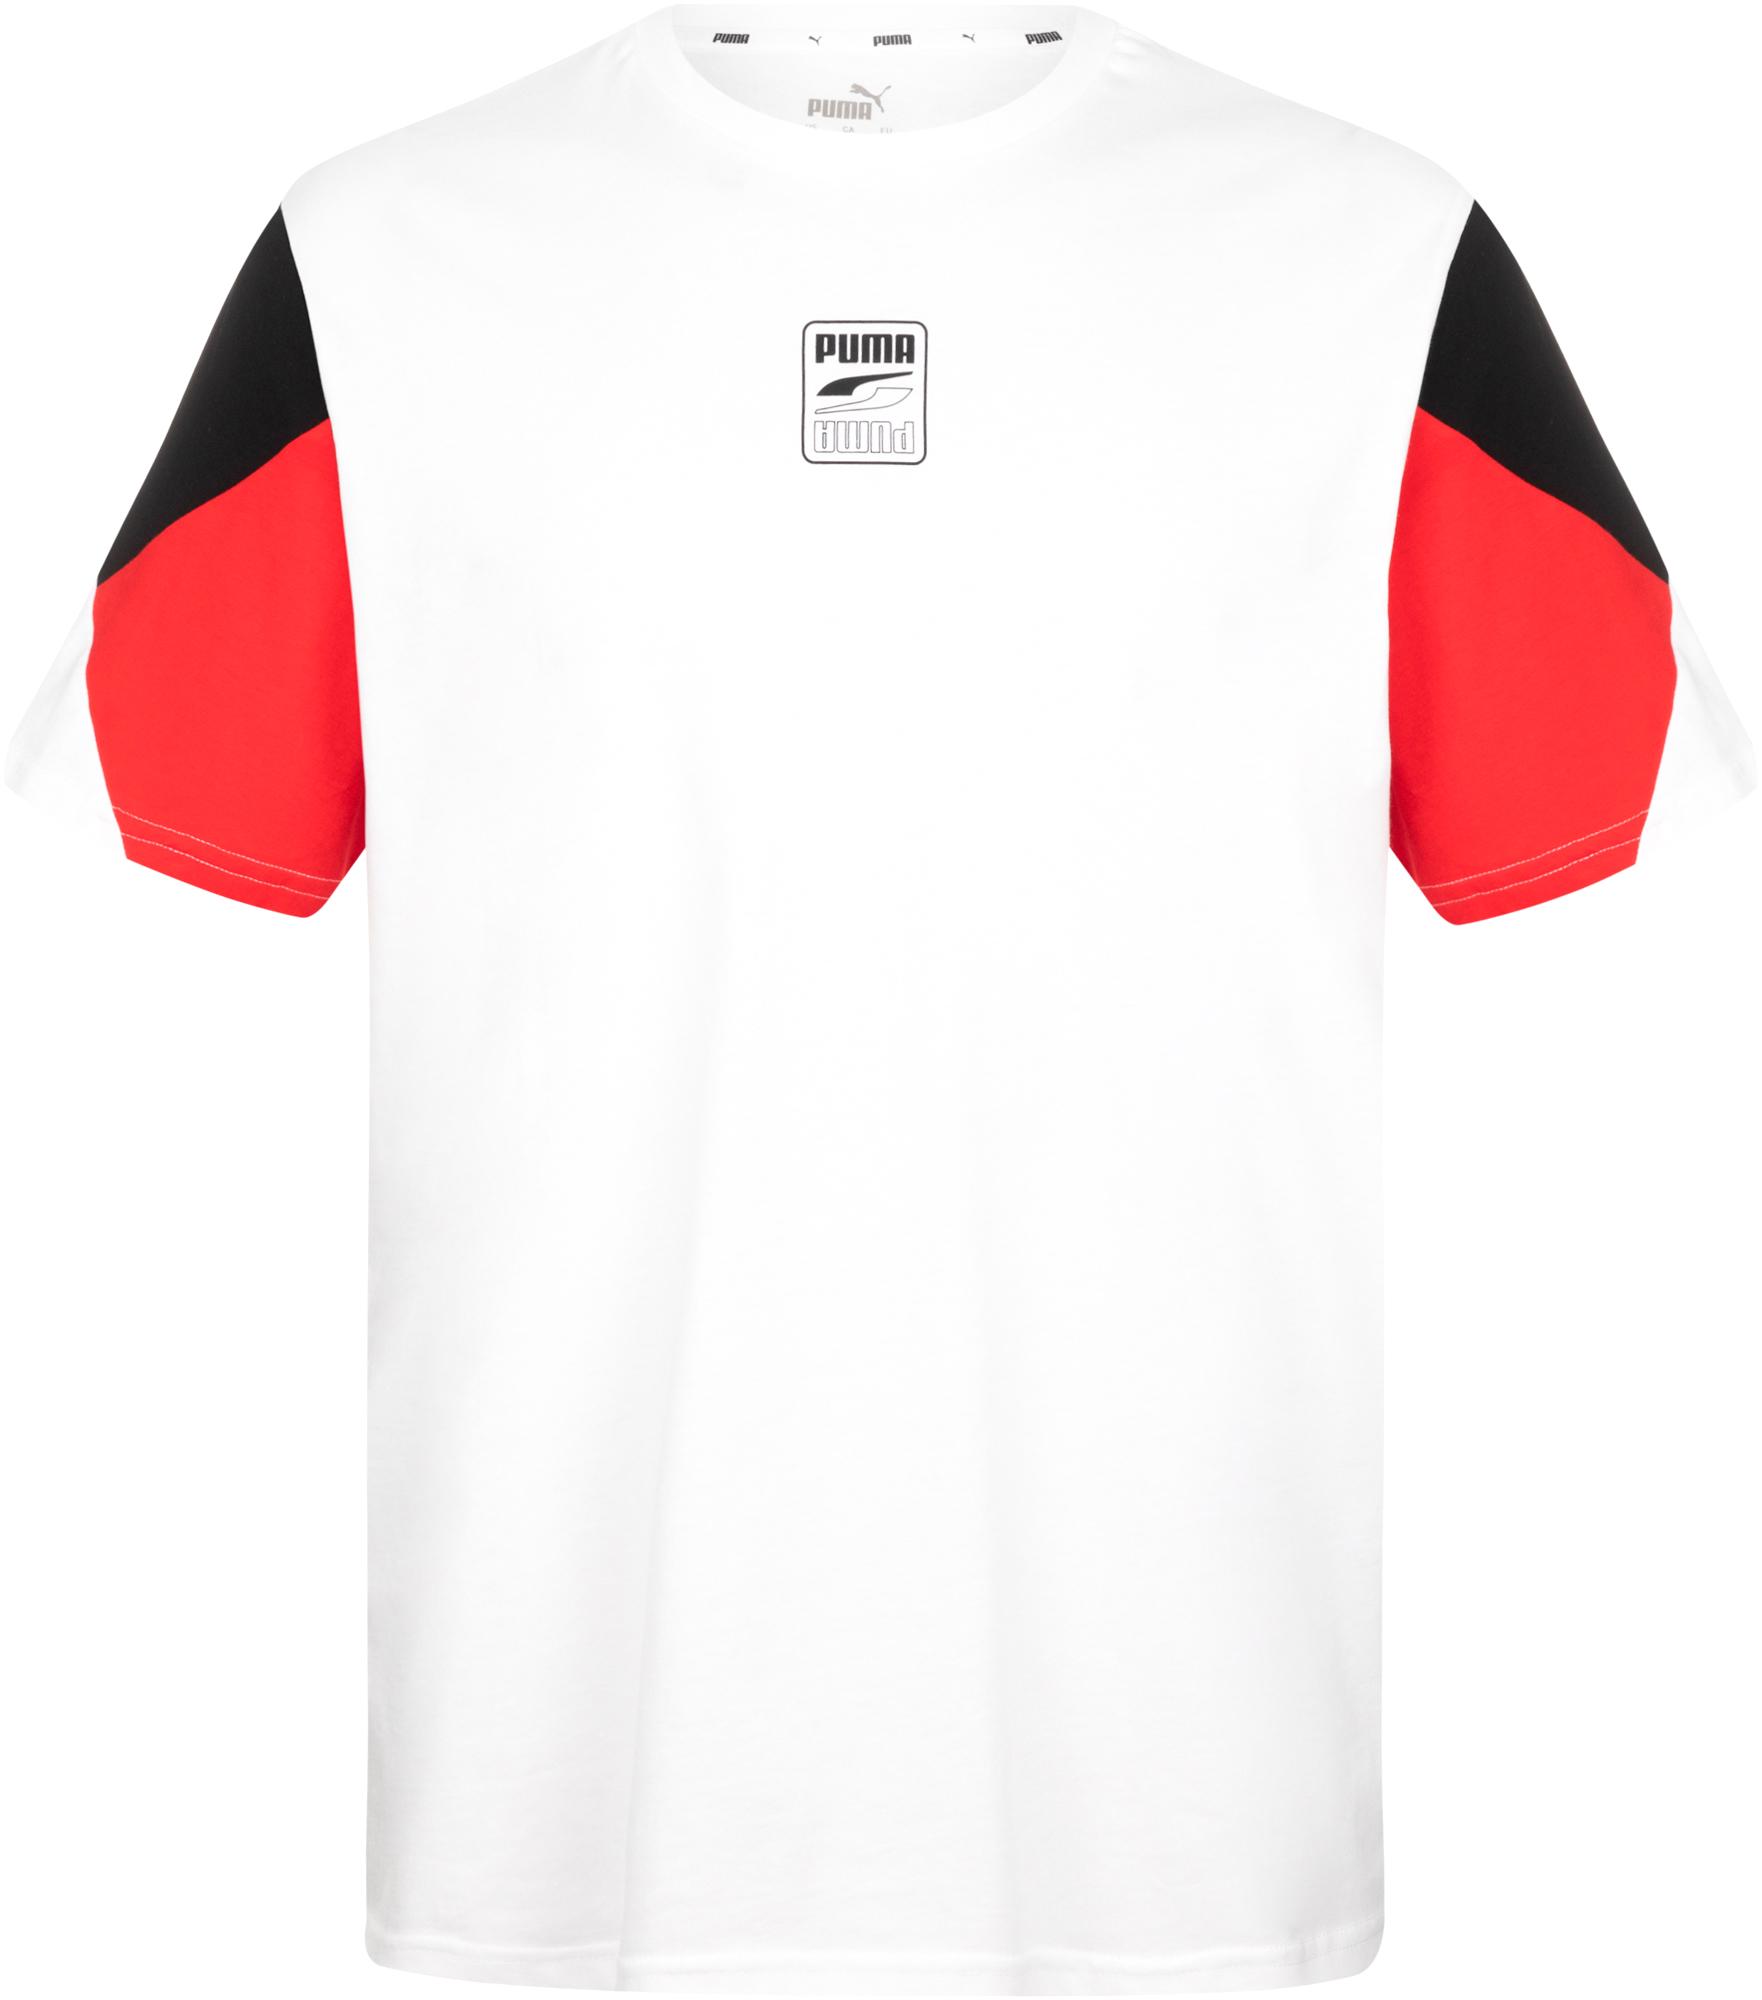 Puma Футболка мужская Puma Rebel Advanced Tee, размер 48-50 футболка мужская puma basic 2p crew tee цвет черный 2 шт 90668901 размер s 44 46